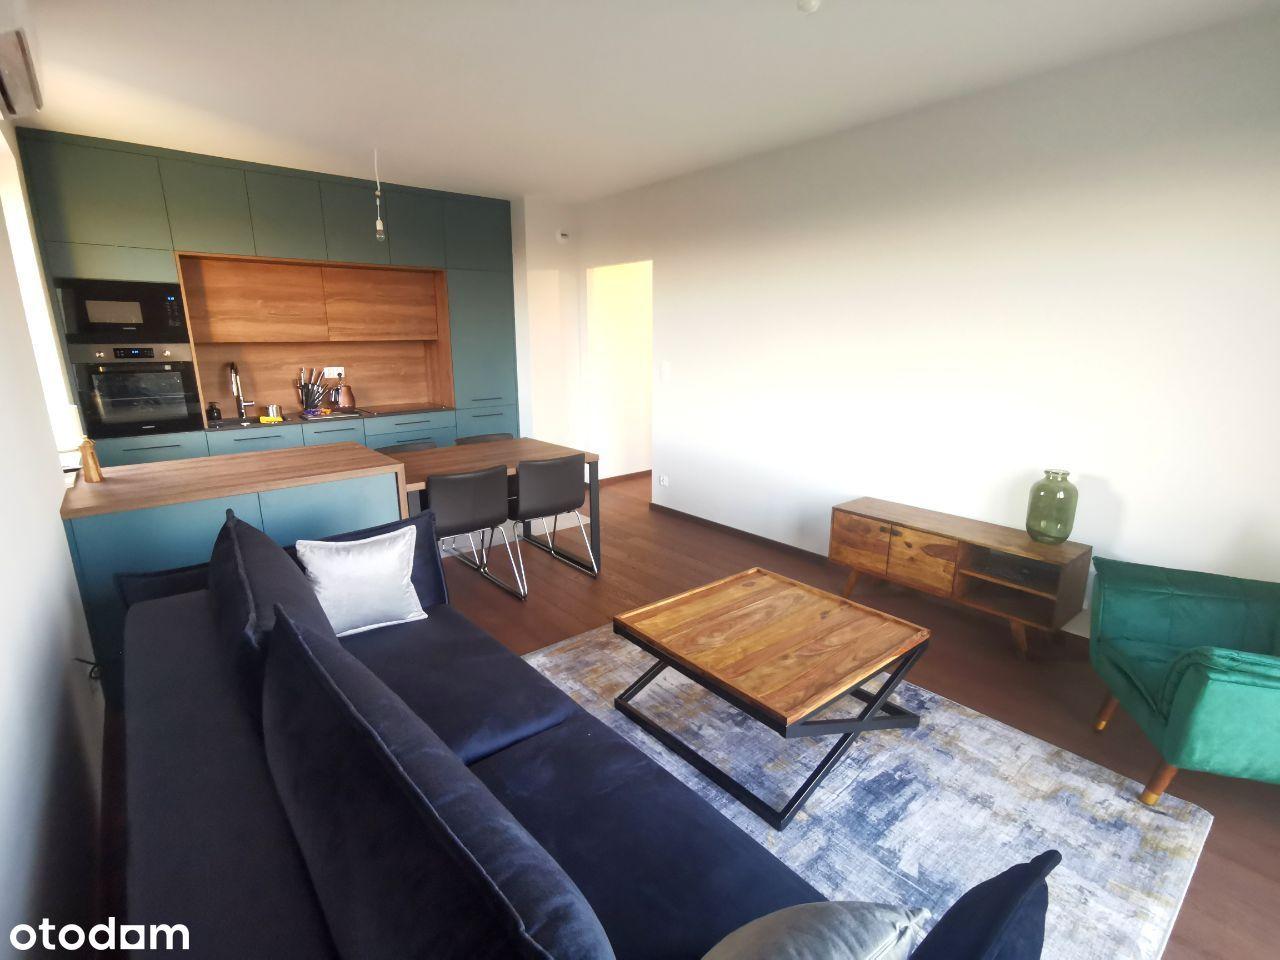 3 pok. apartament 60m2, garaż, Port Popowice